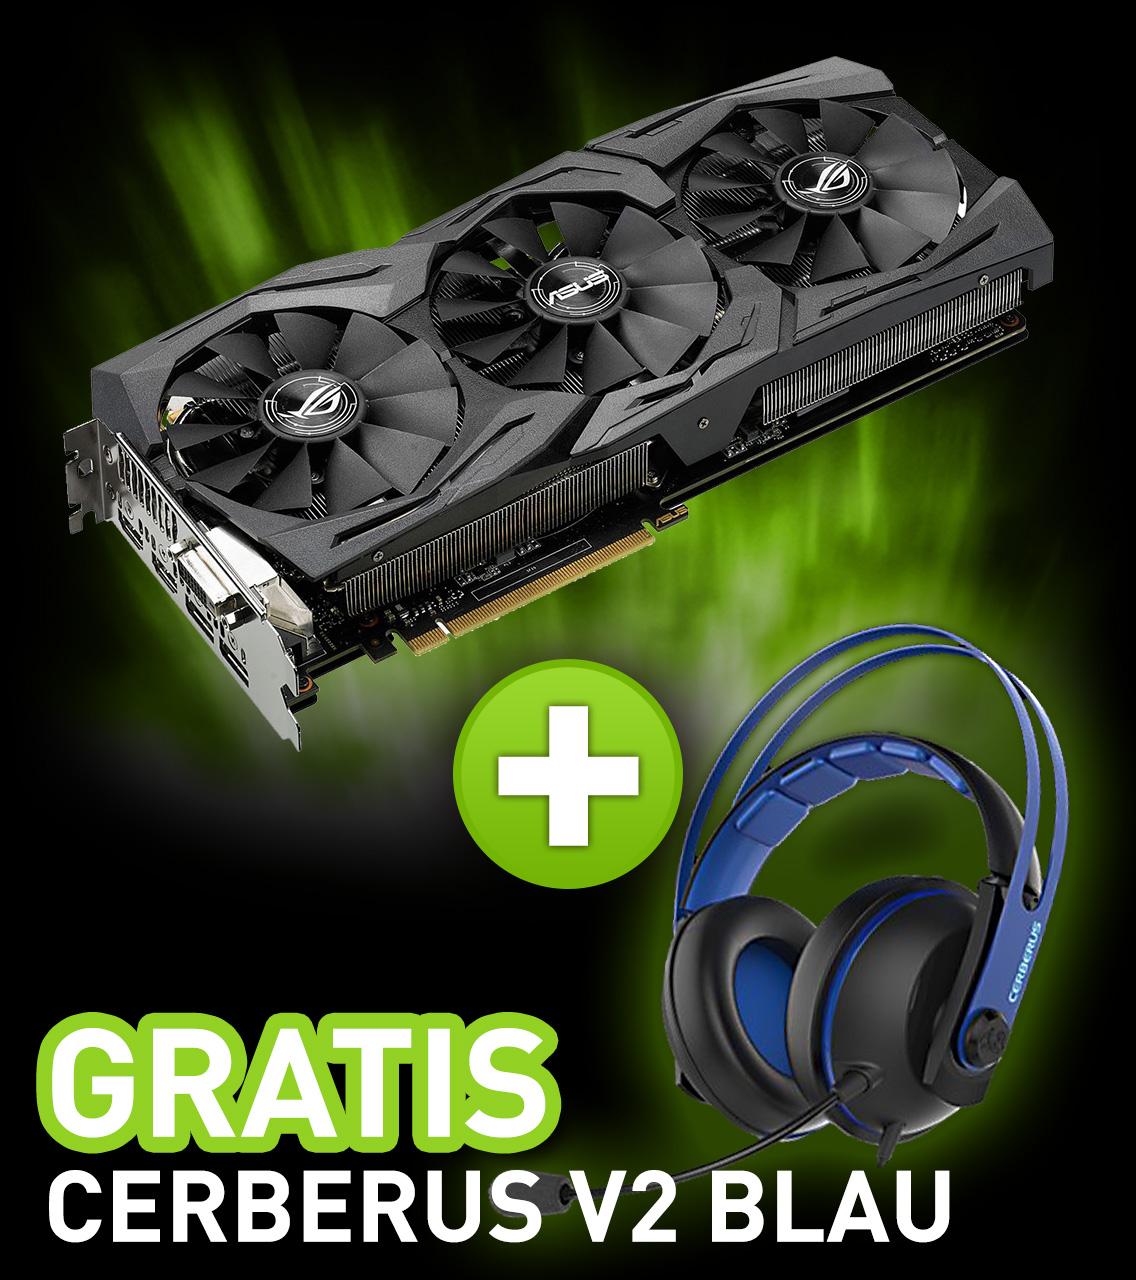 8GB Asus GeForce GTX 1080 Strix Advanced Aktiv PCIe 3.0 x16 (Retail)